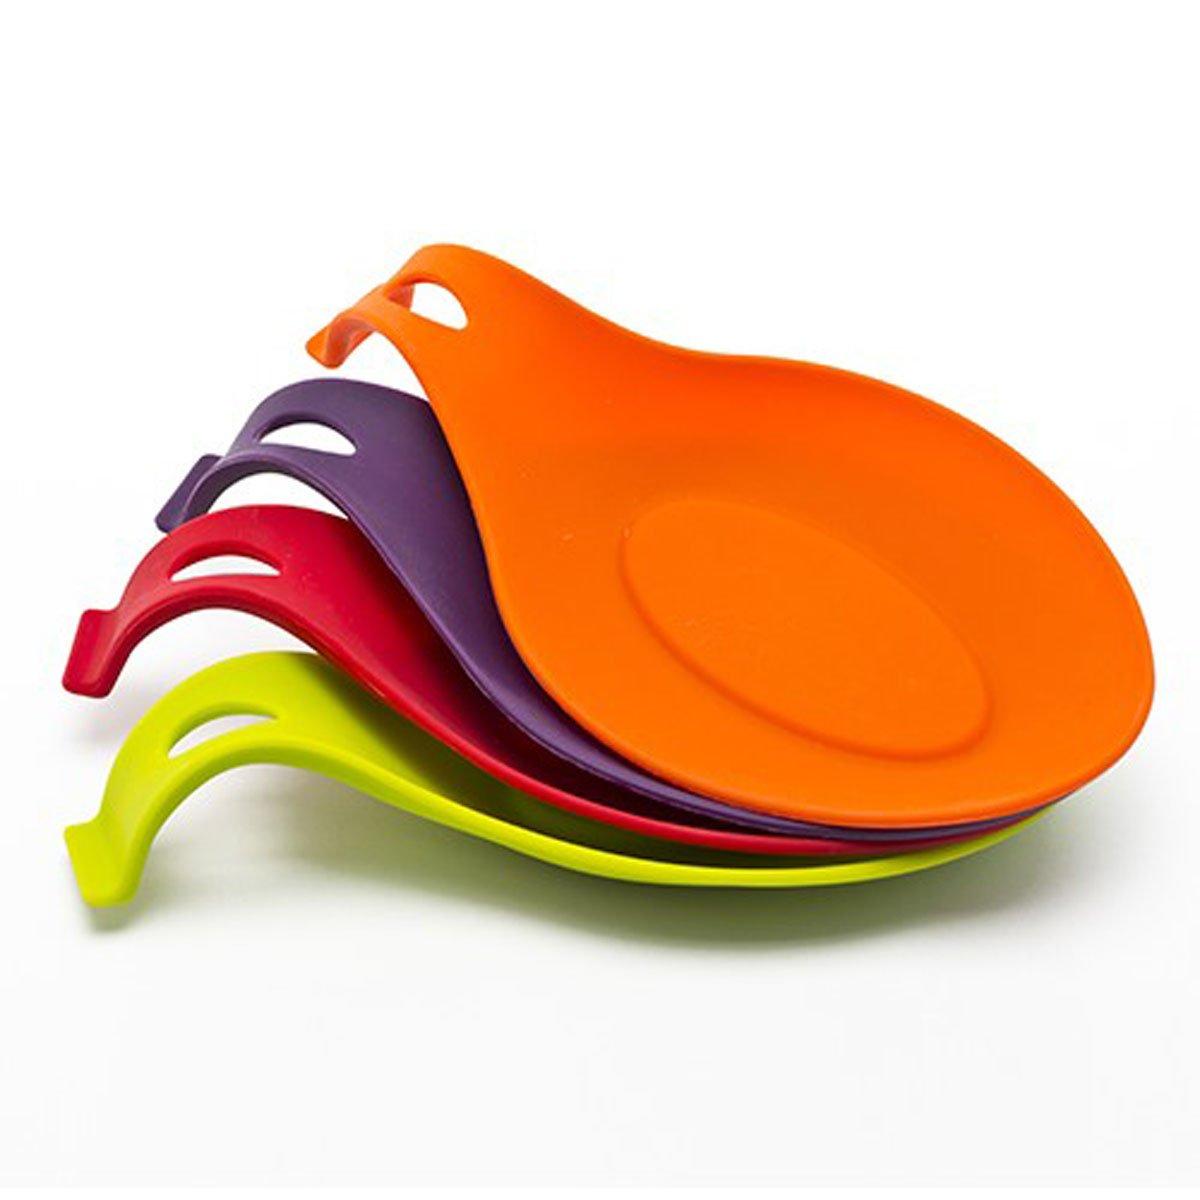 Porta cuchara silic n varios colores crown baccara sears for Porta cucharas cocina